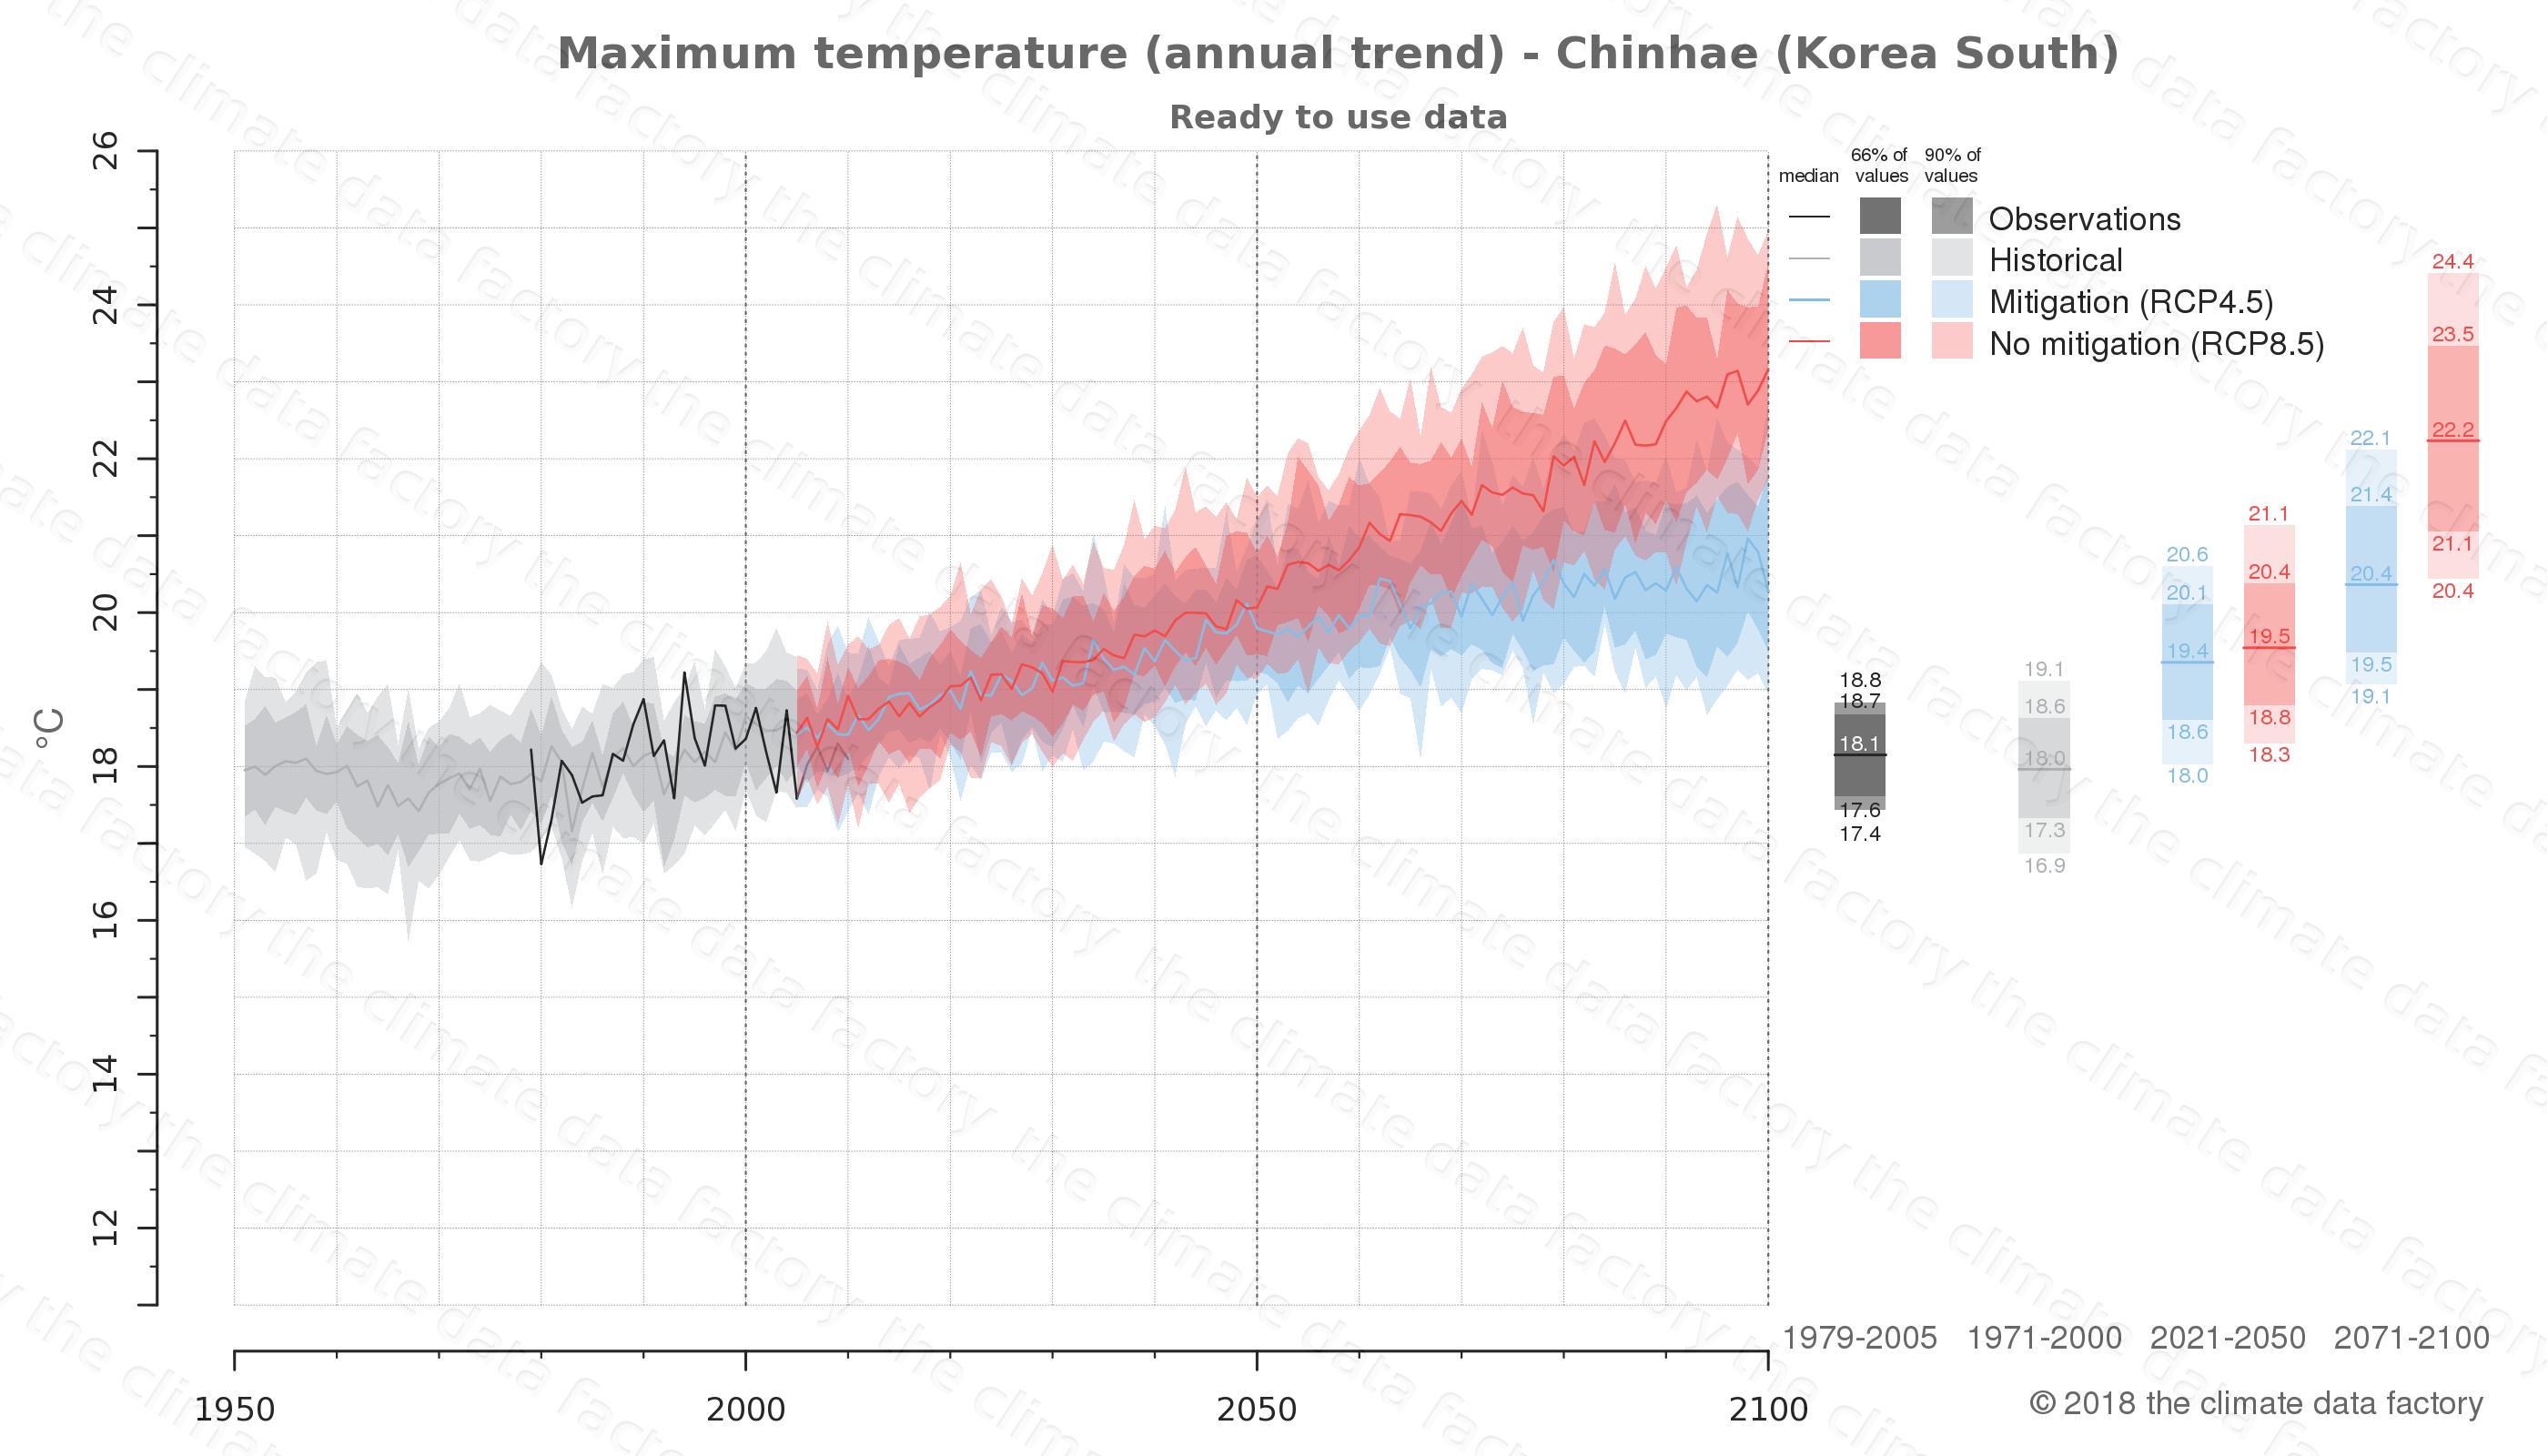 climate change data policy adaptation climate graph city data maximum-temperature chinhae south korea